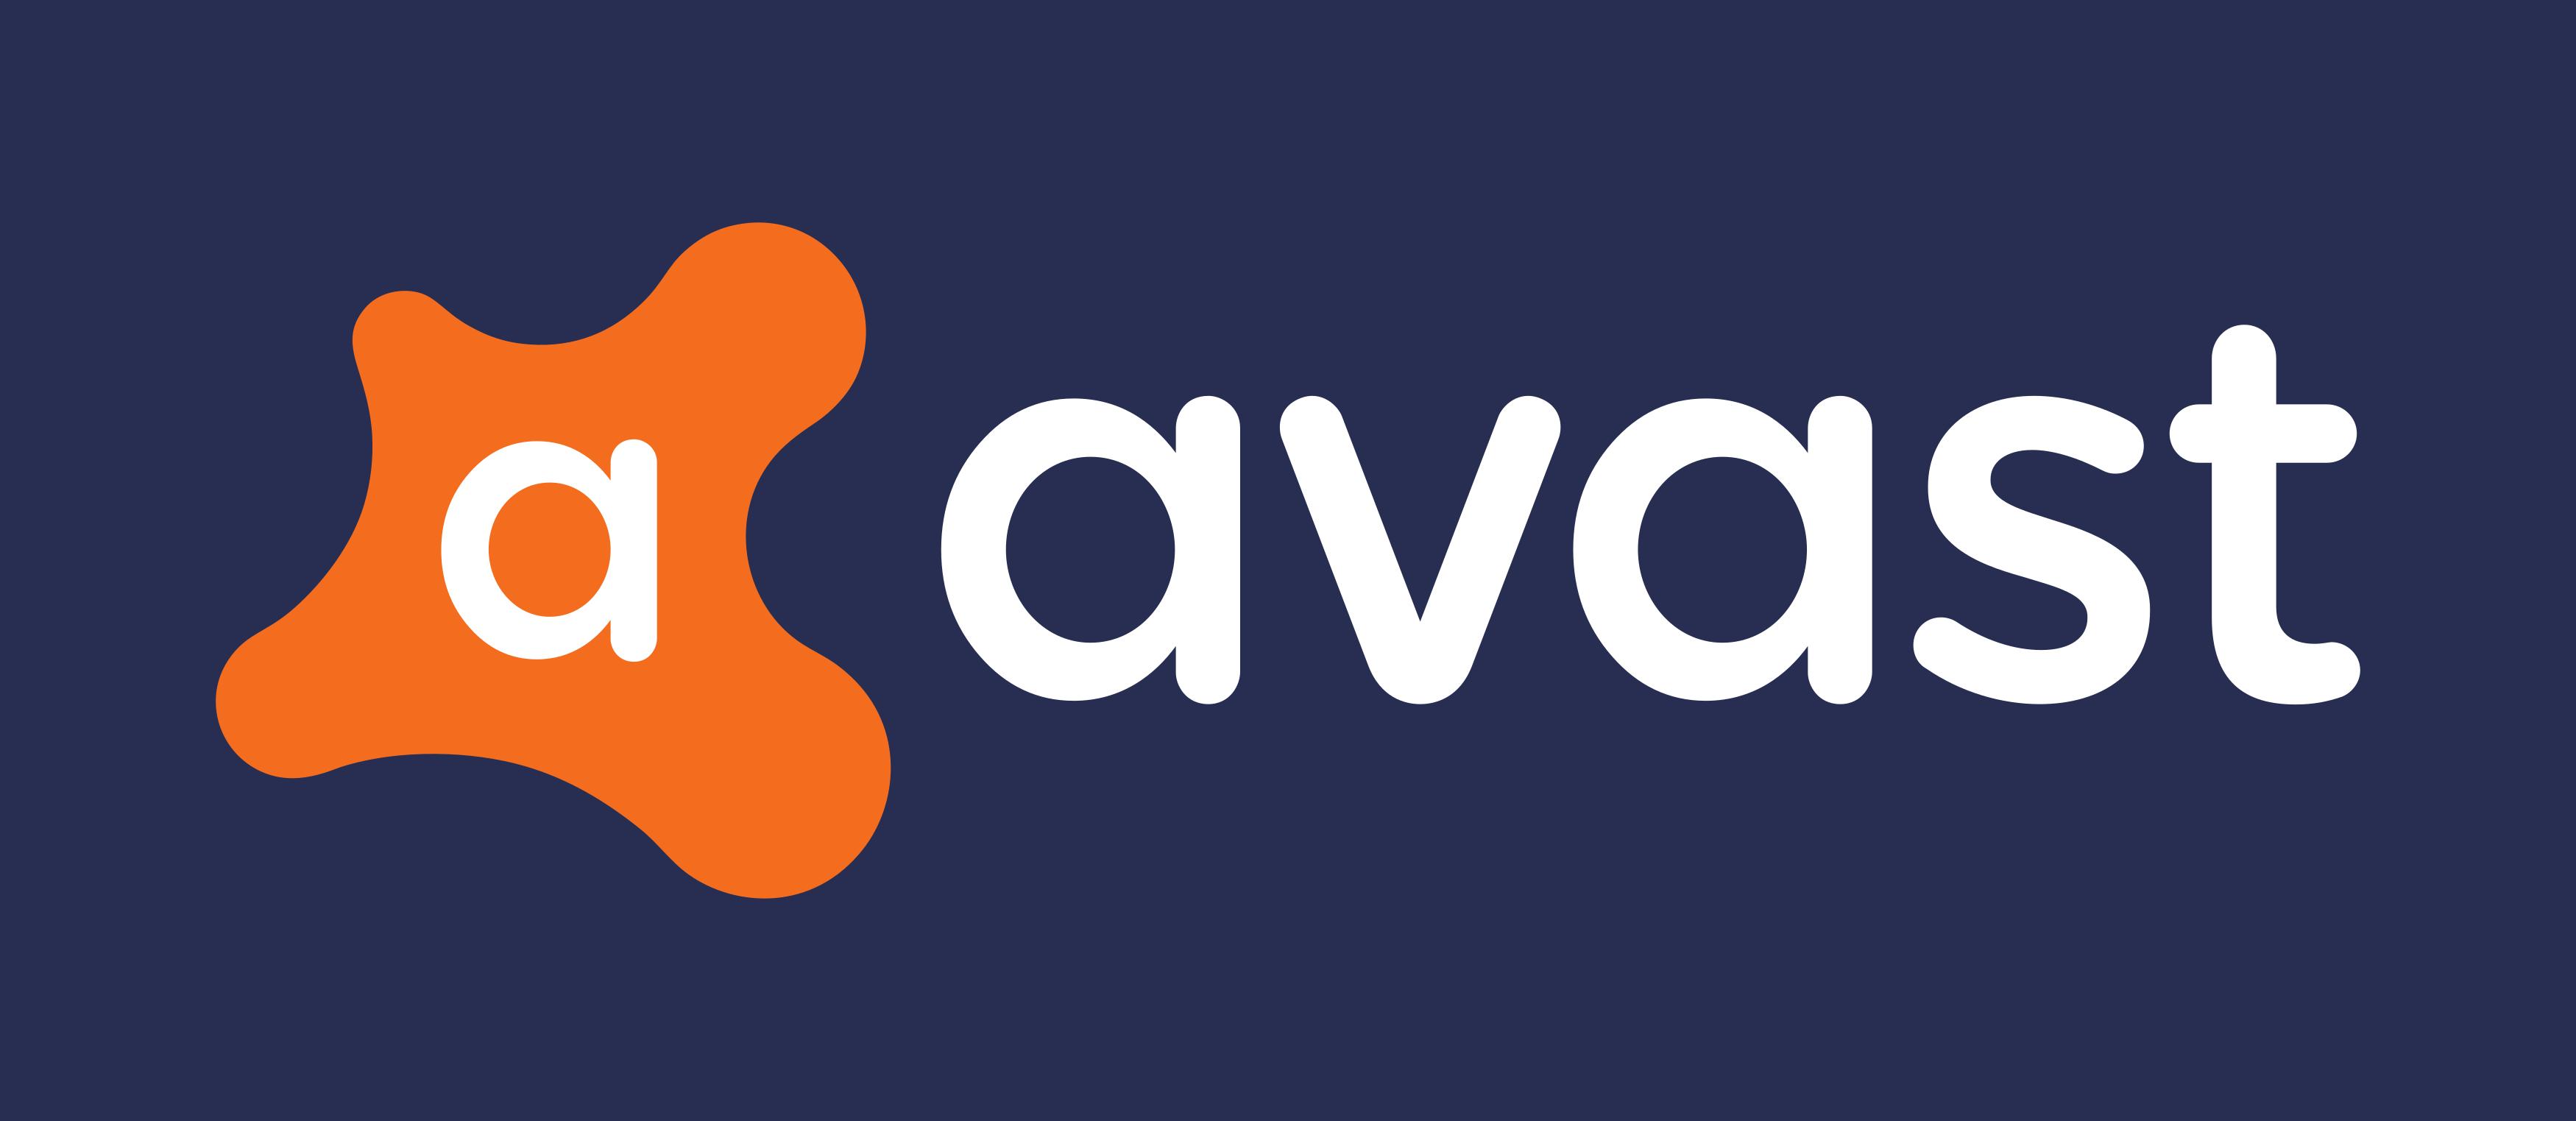 avast logo 1 - Avast Logo